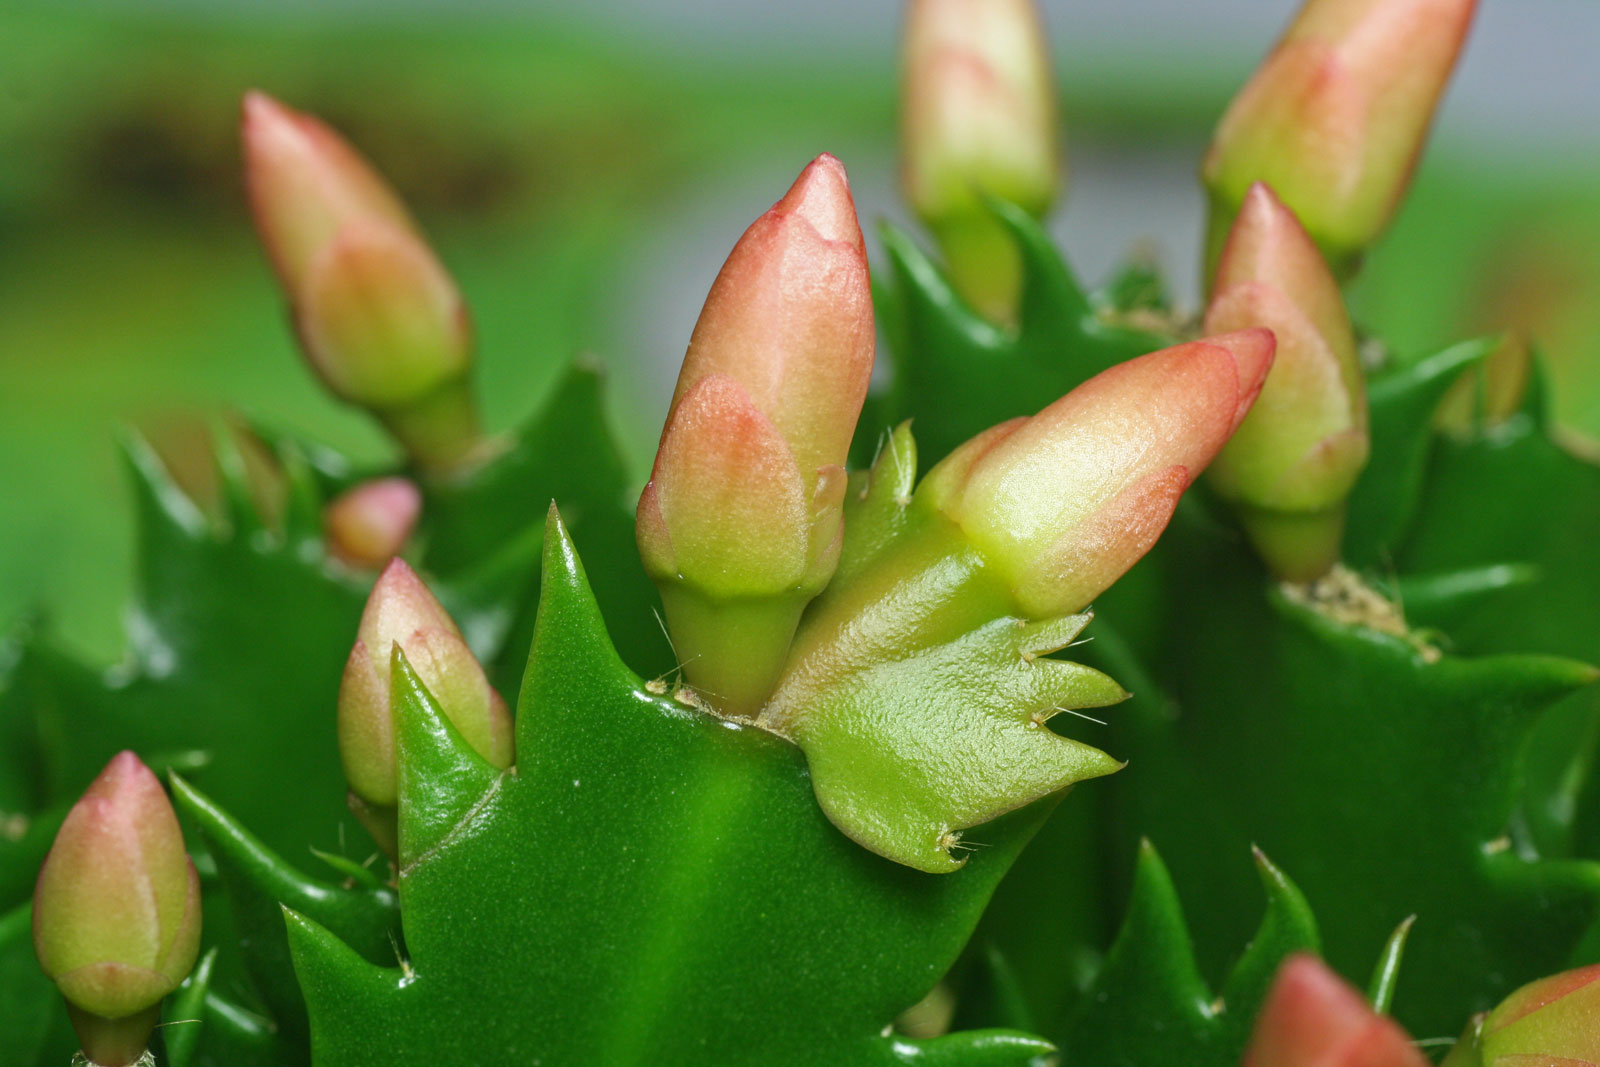 Weihnachtskaktus-Blütenknospen